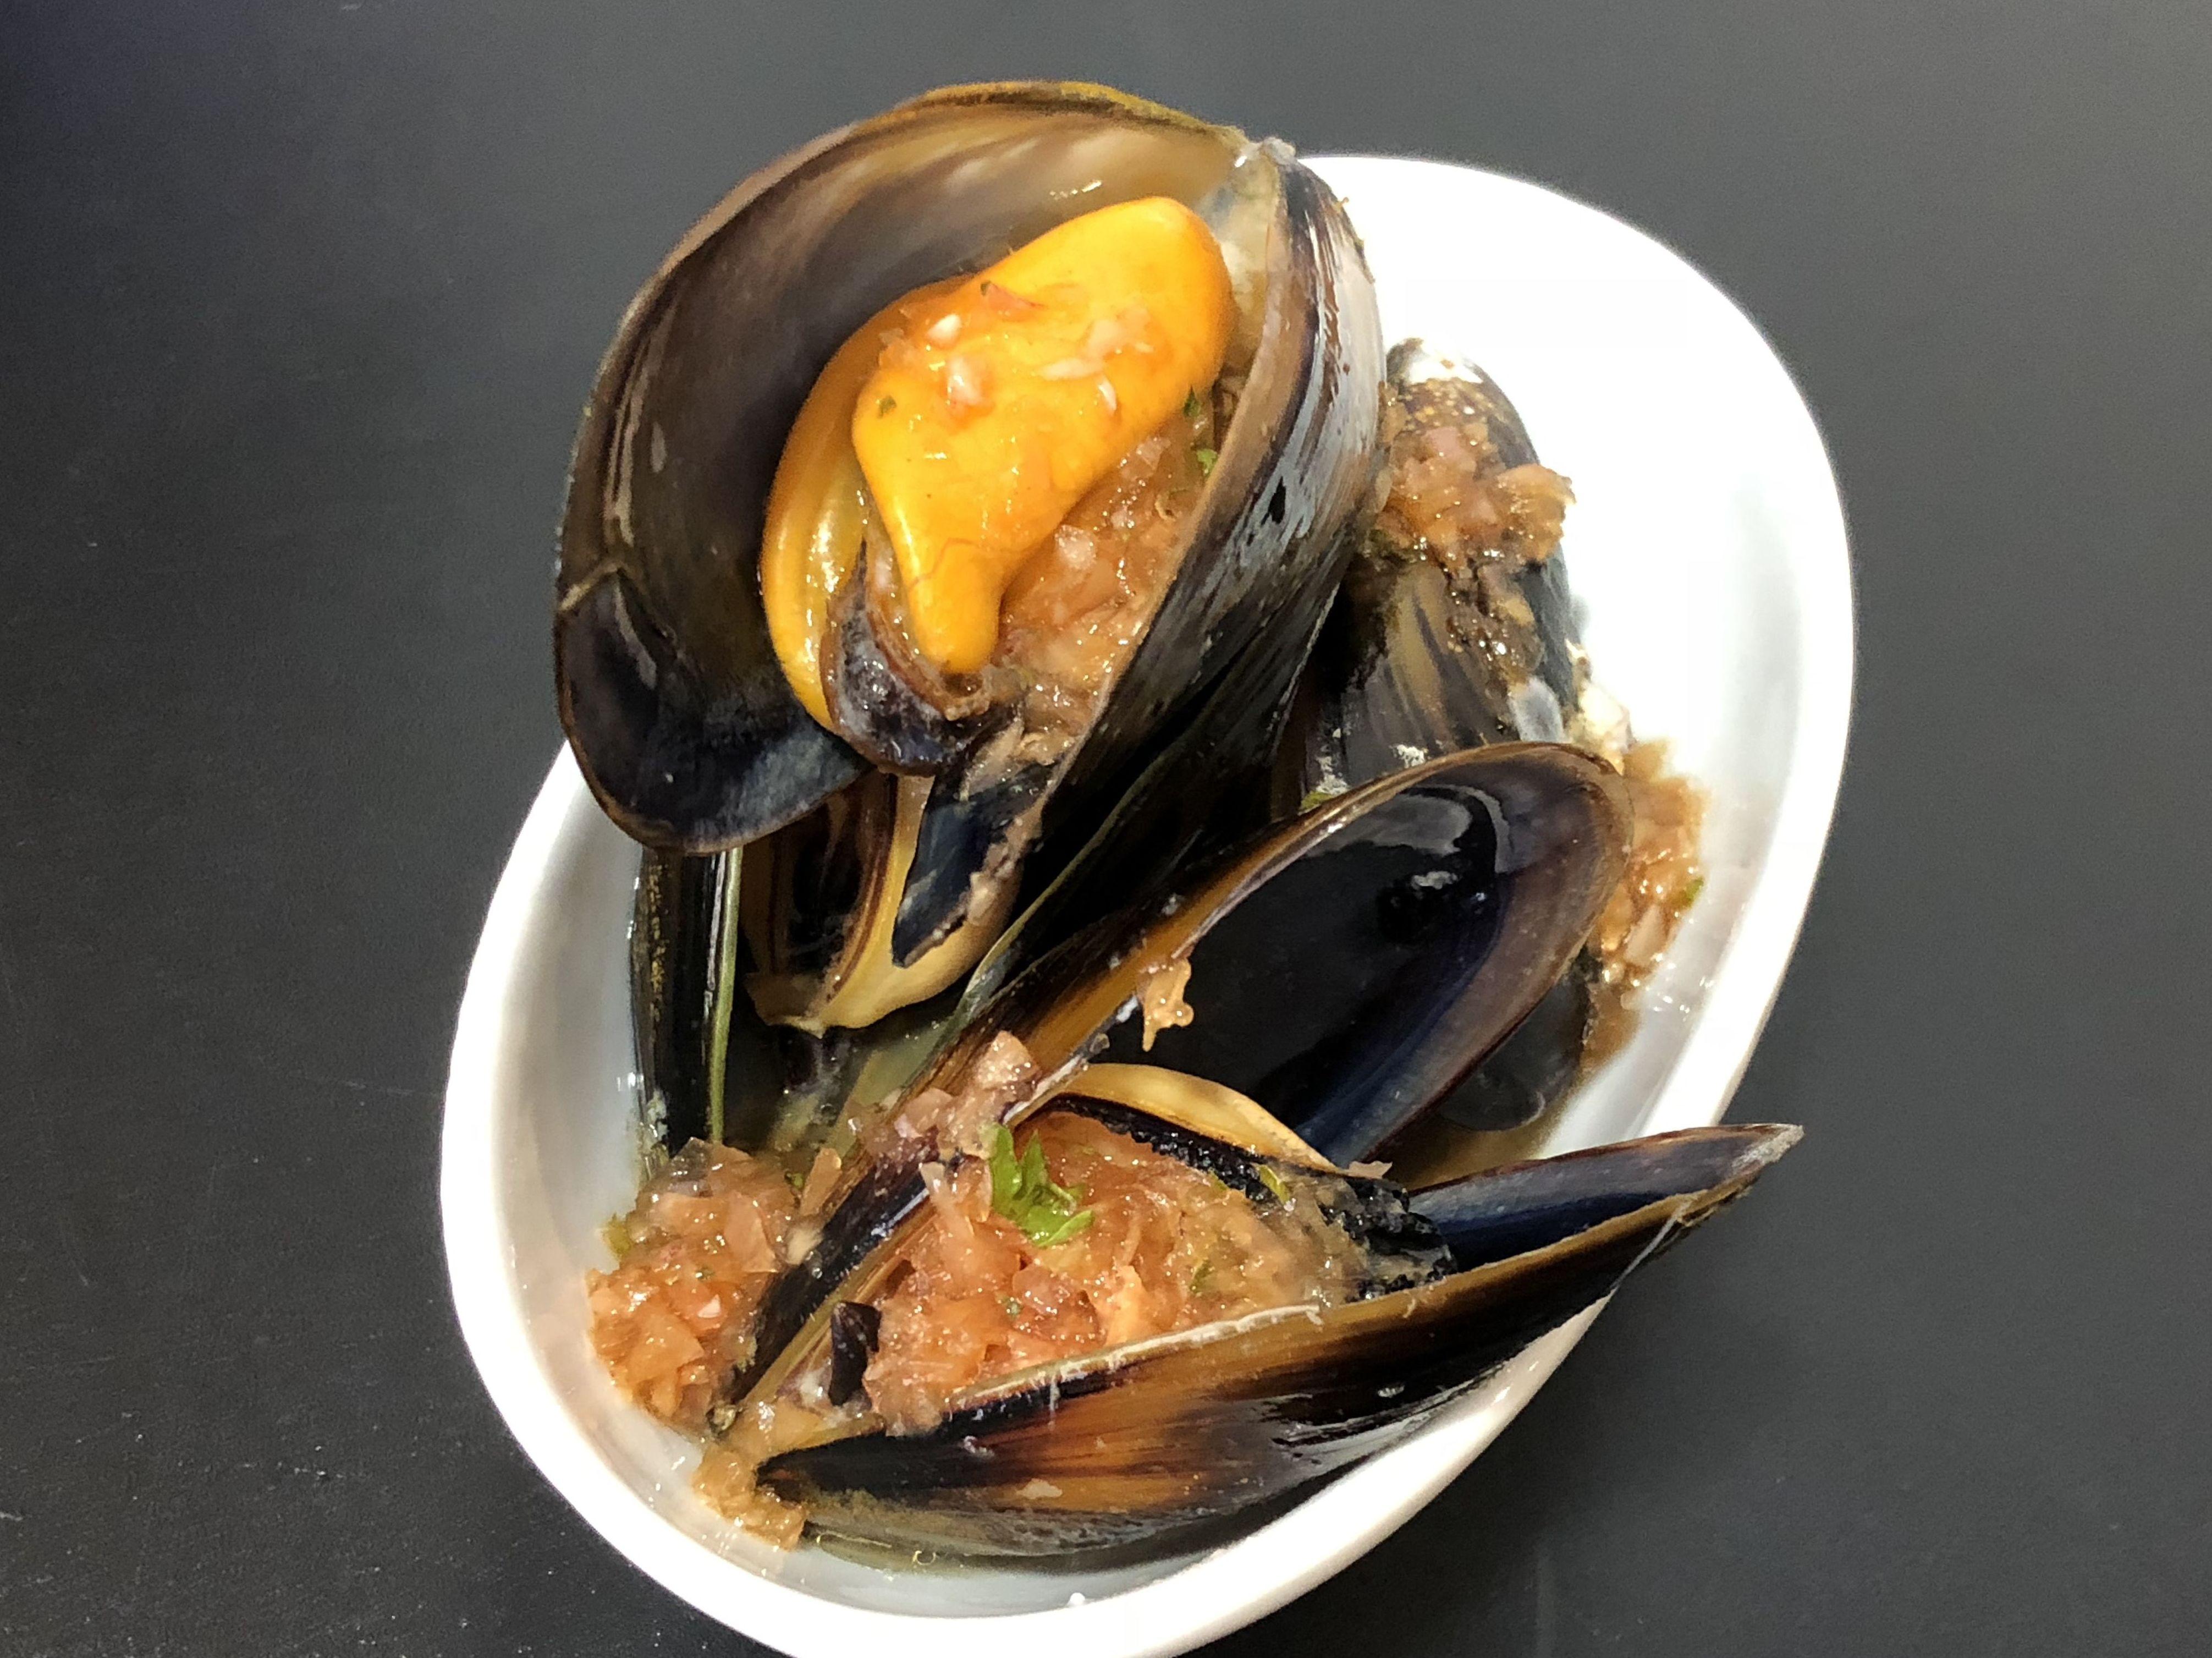 Foto 1 de Restaurante japonés en Oviedo | Umami